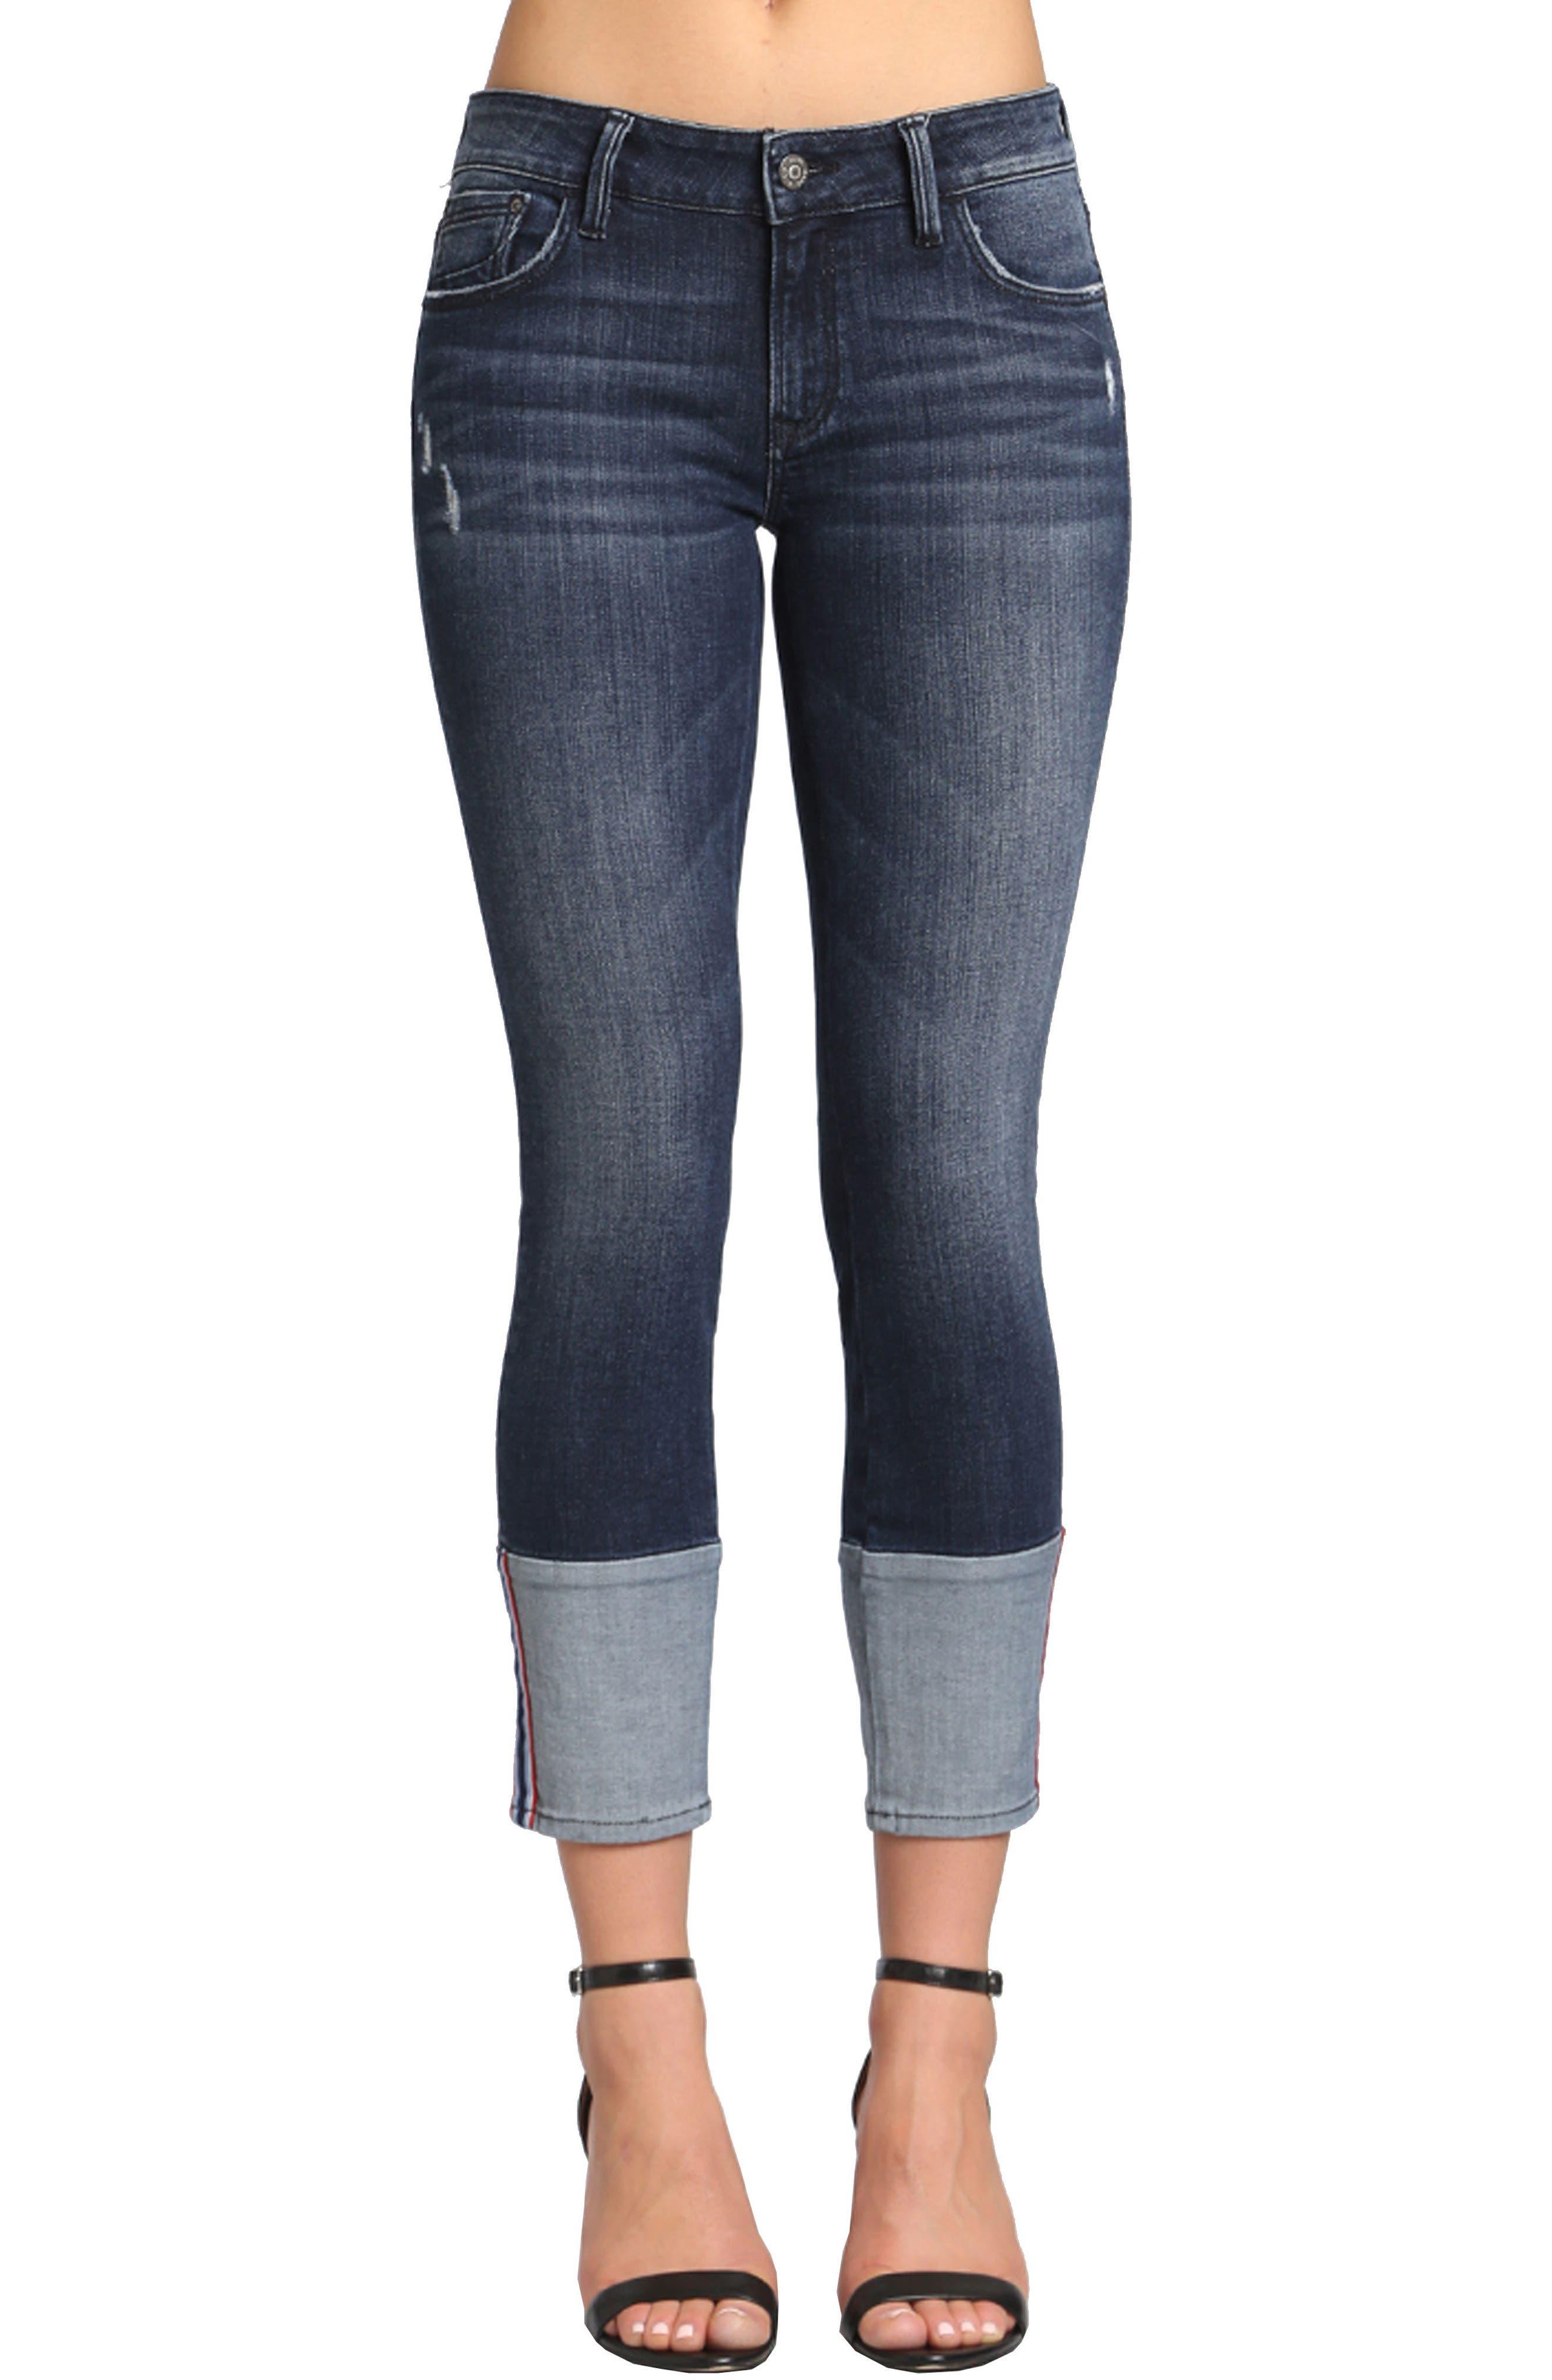 Mavi Jeans Caisy Cuffed Skinny Crop Jeans (Dark Vintage)